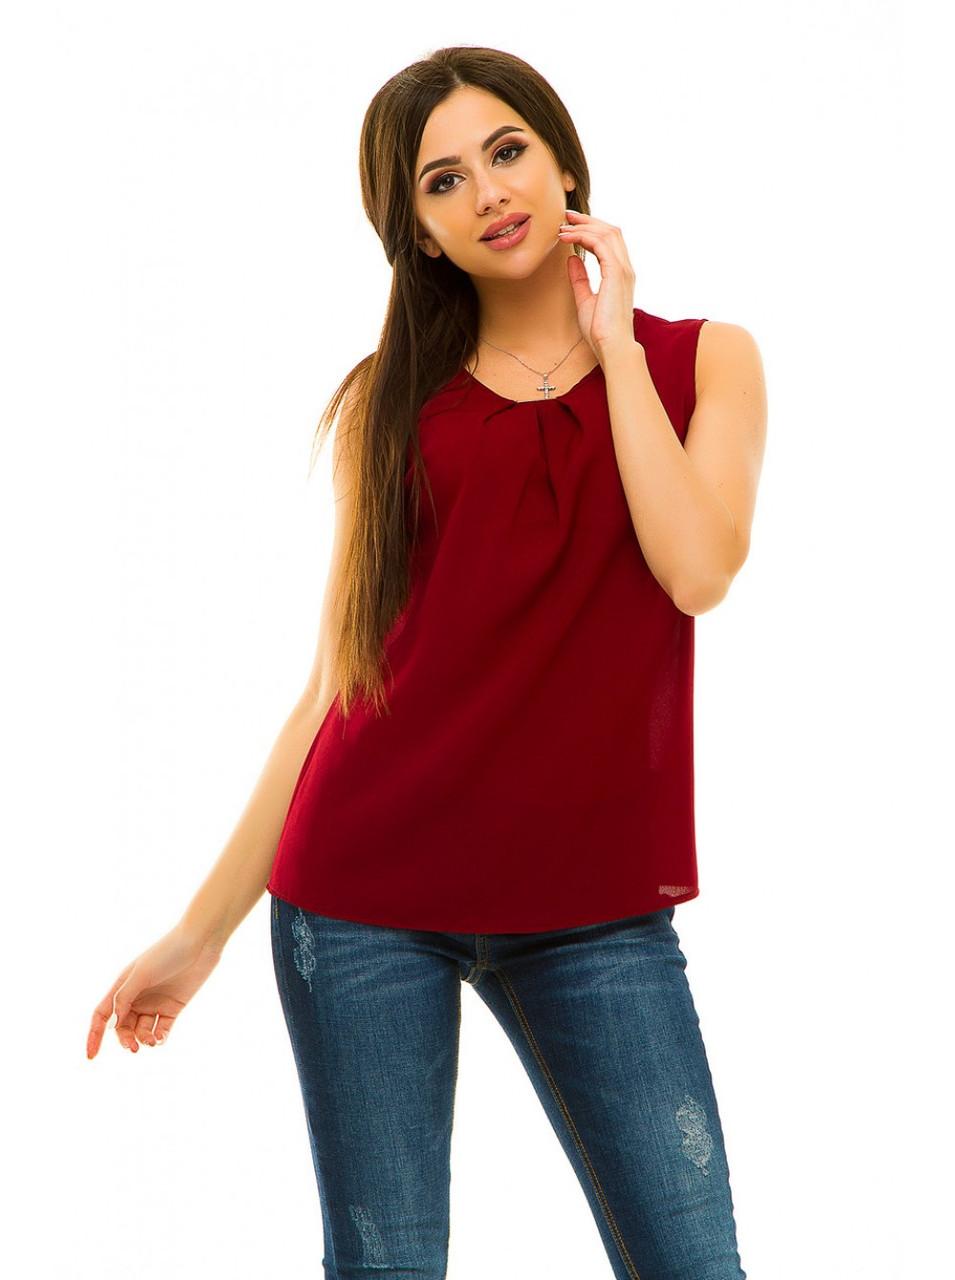 Блузка без рукавов креп-шифон